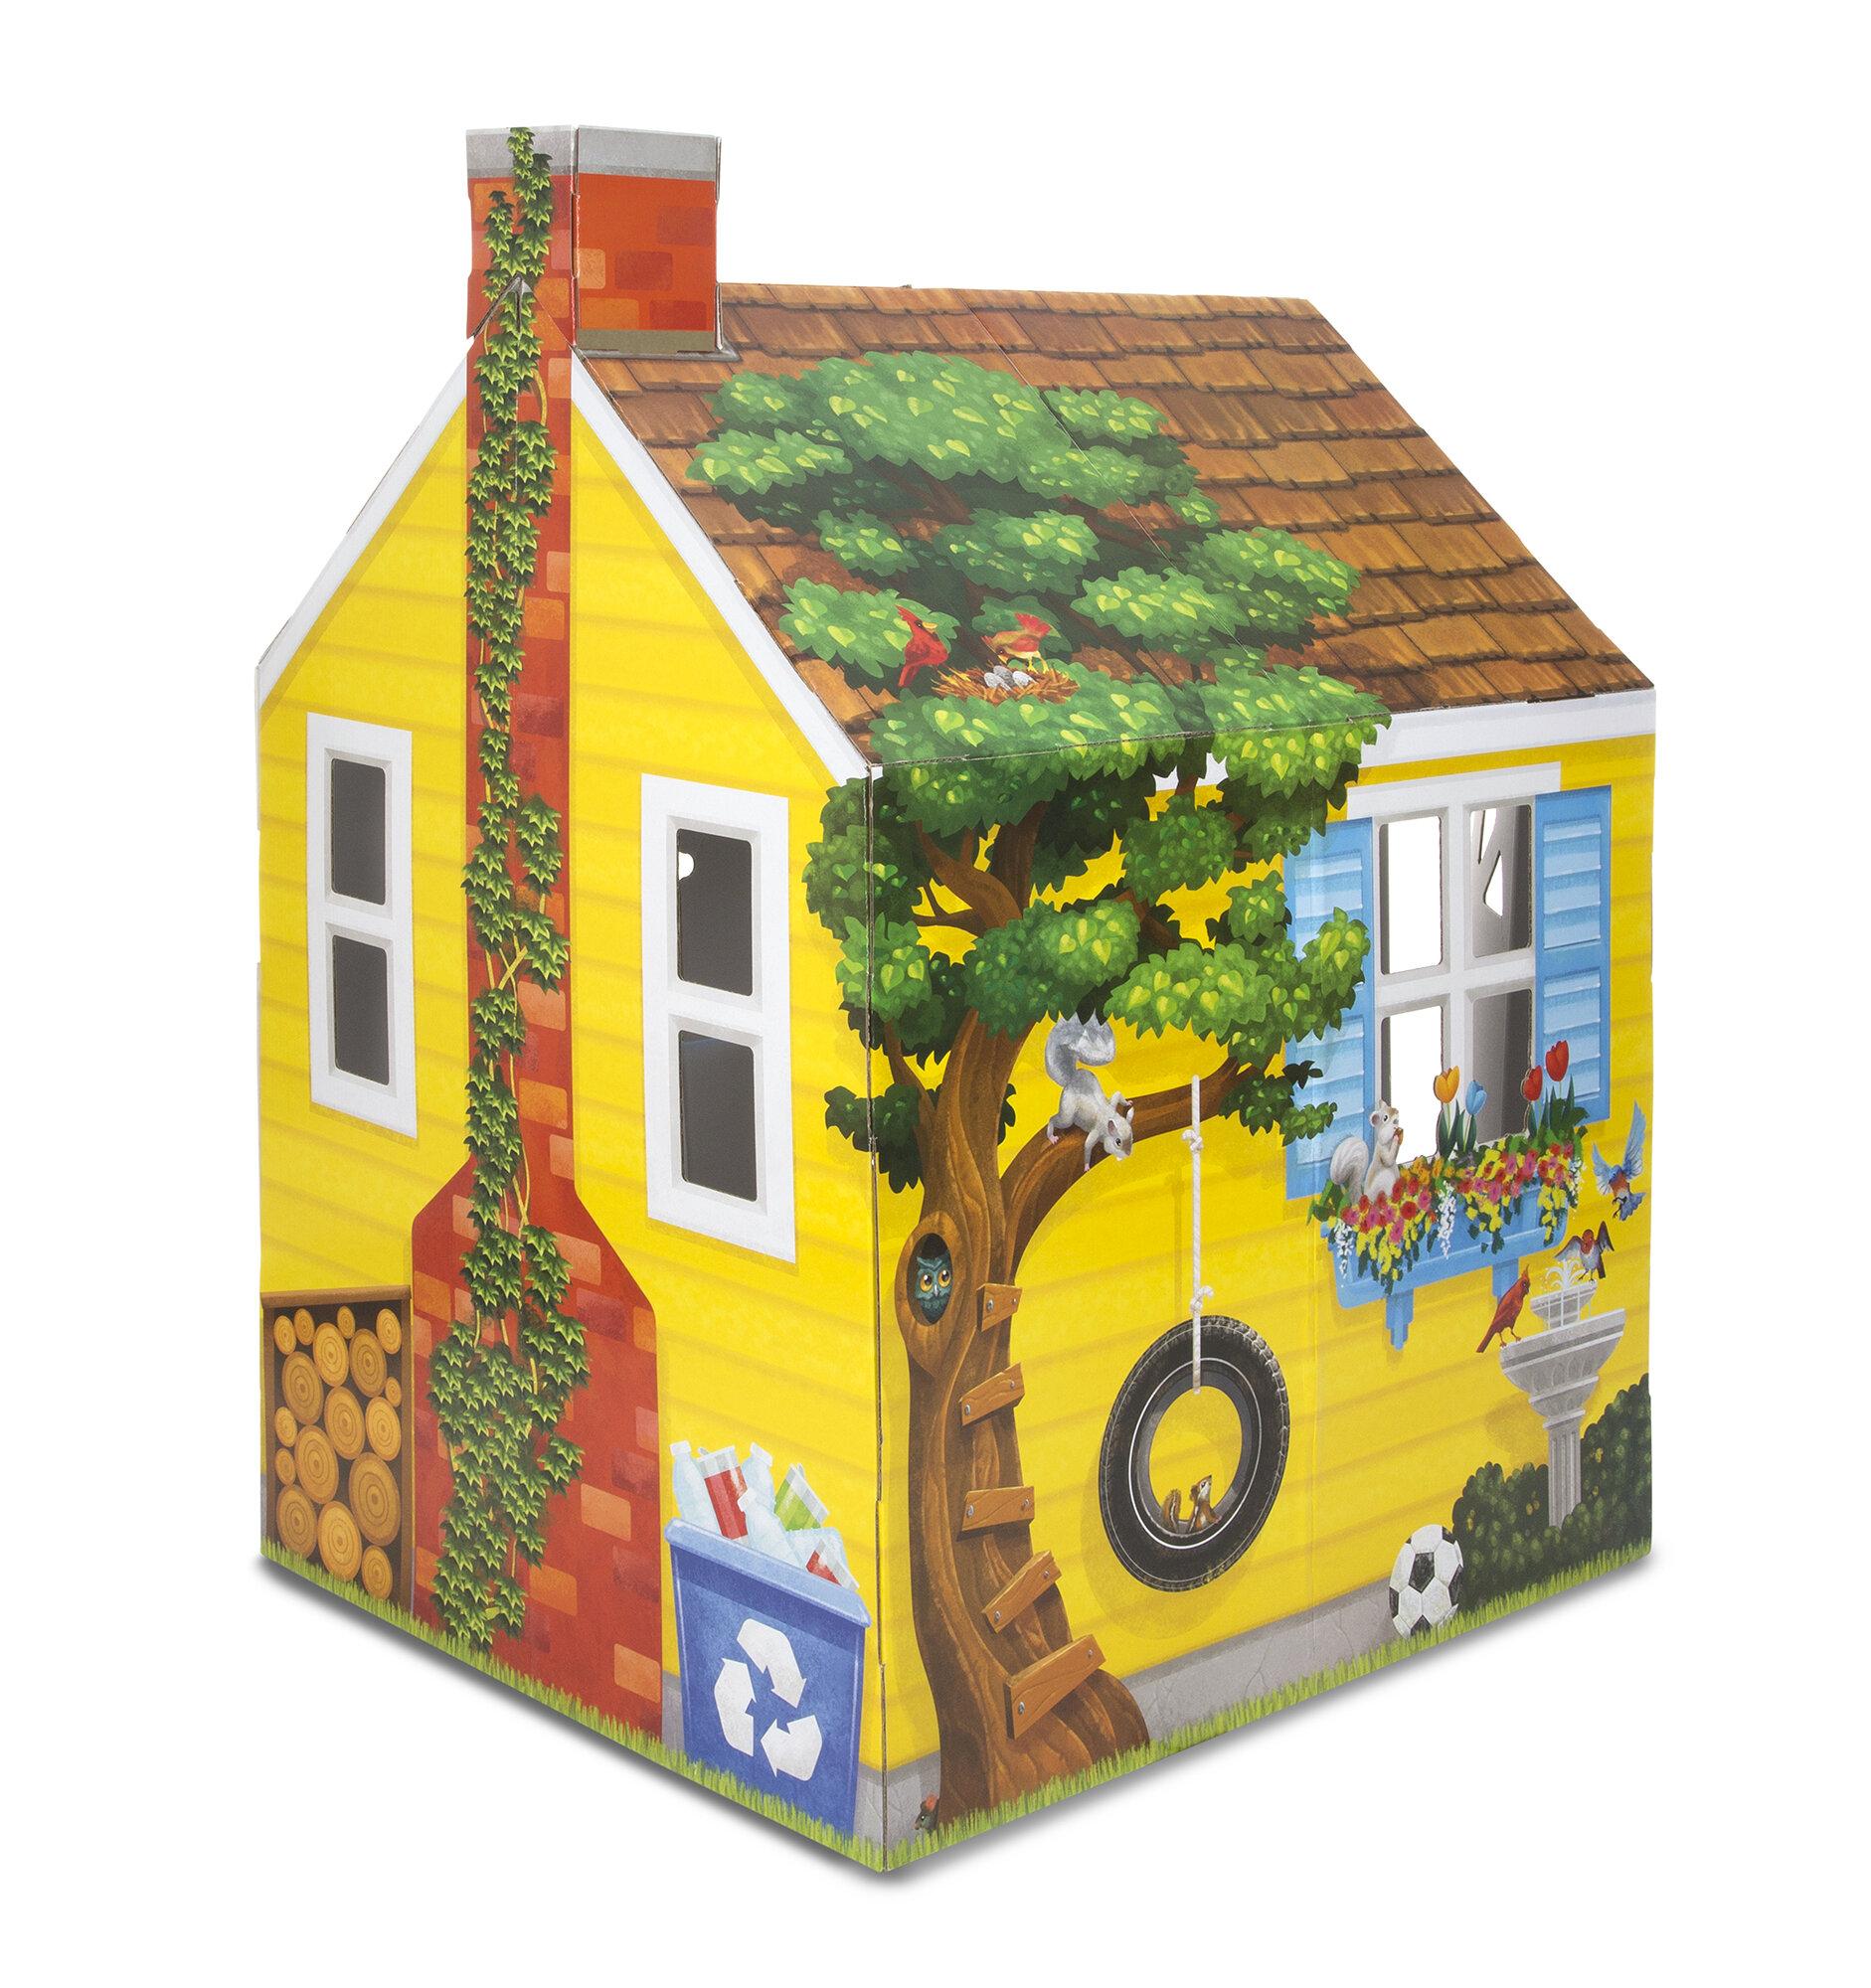 Melissa & Doug Cardboard Structure Cottage 0.13\' Playhouse | Wayfair